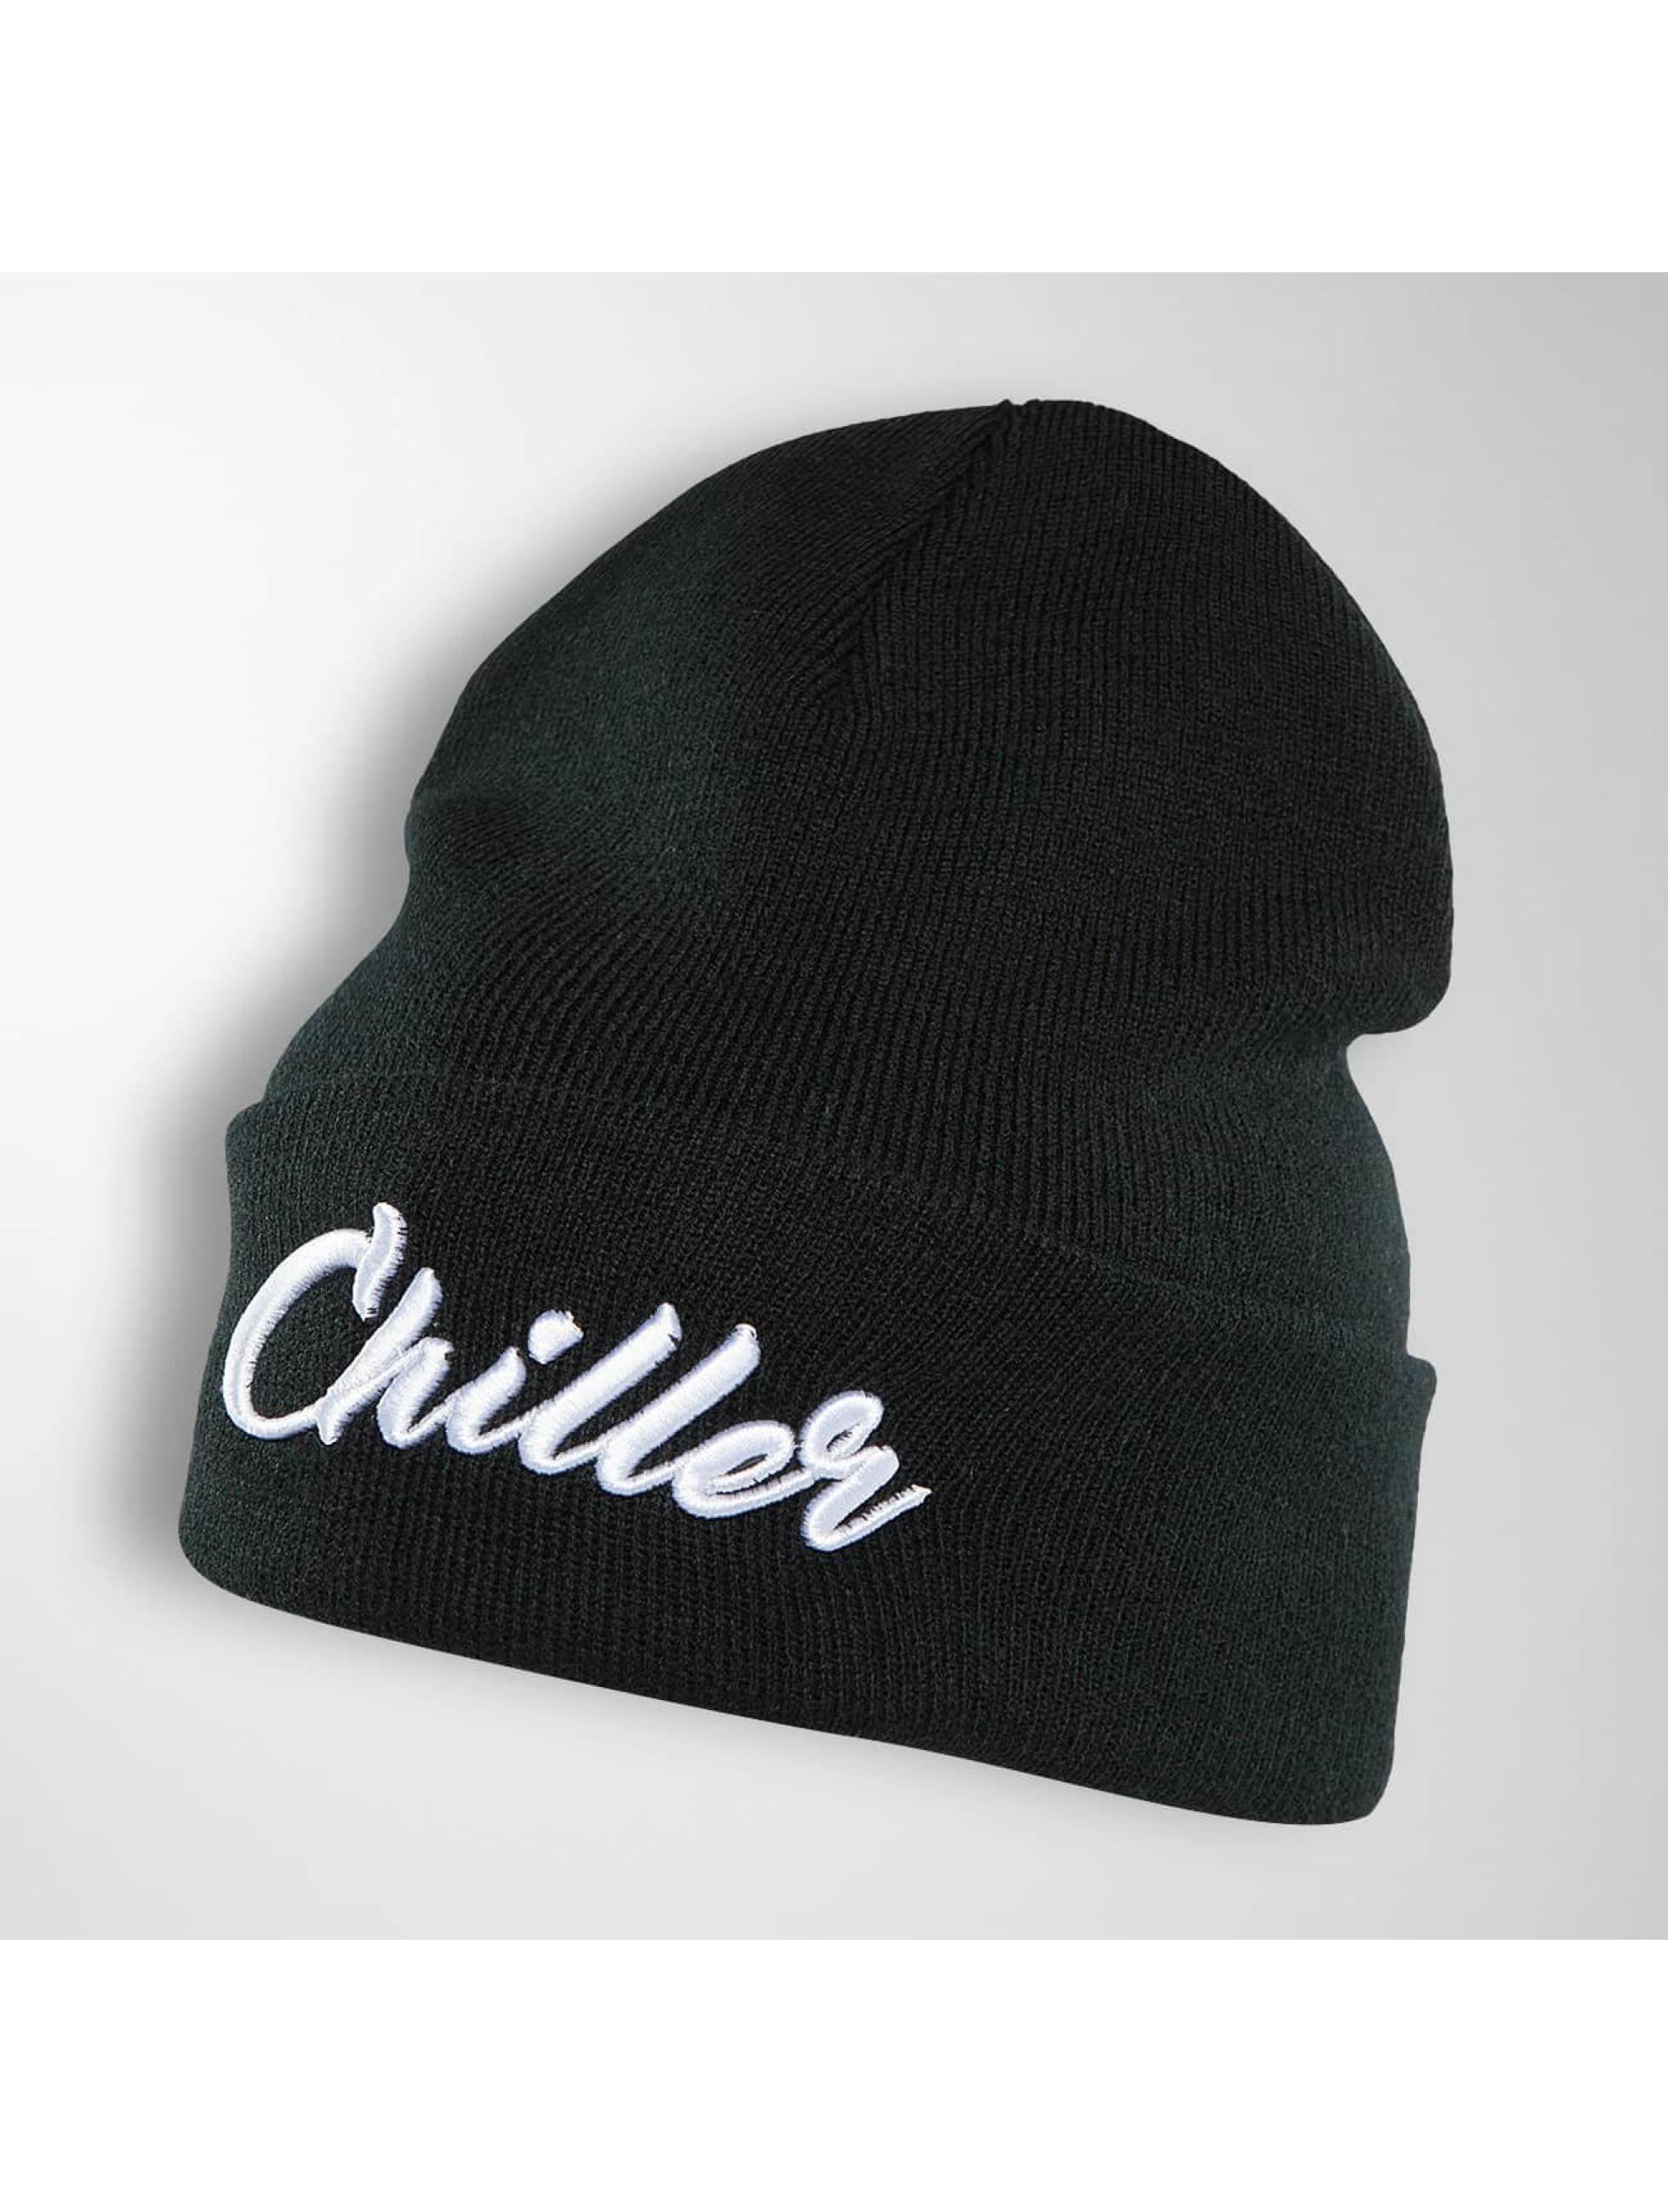 TrueSpin Czapki Chiller czarny